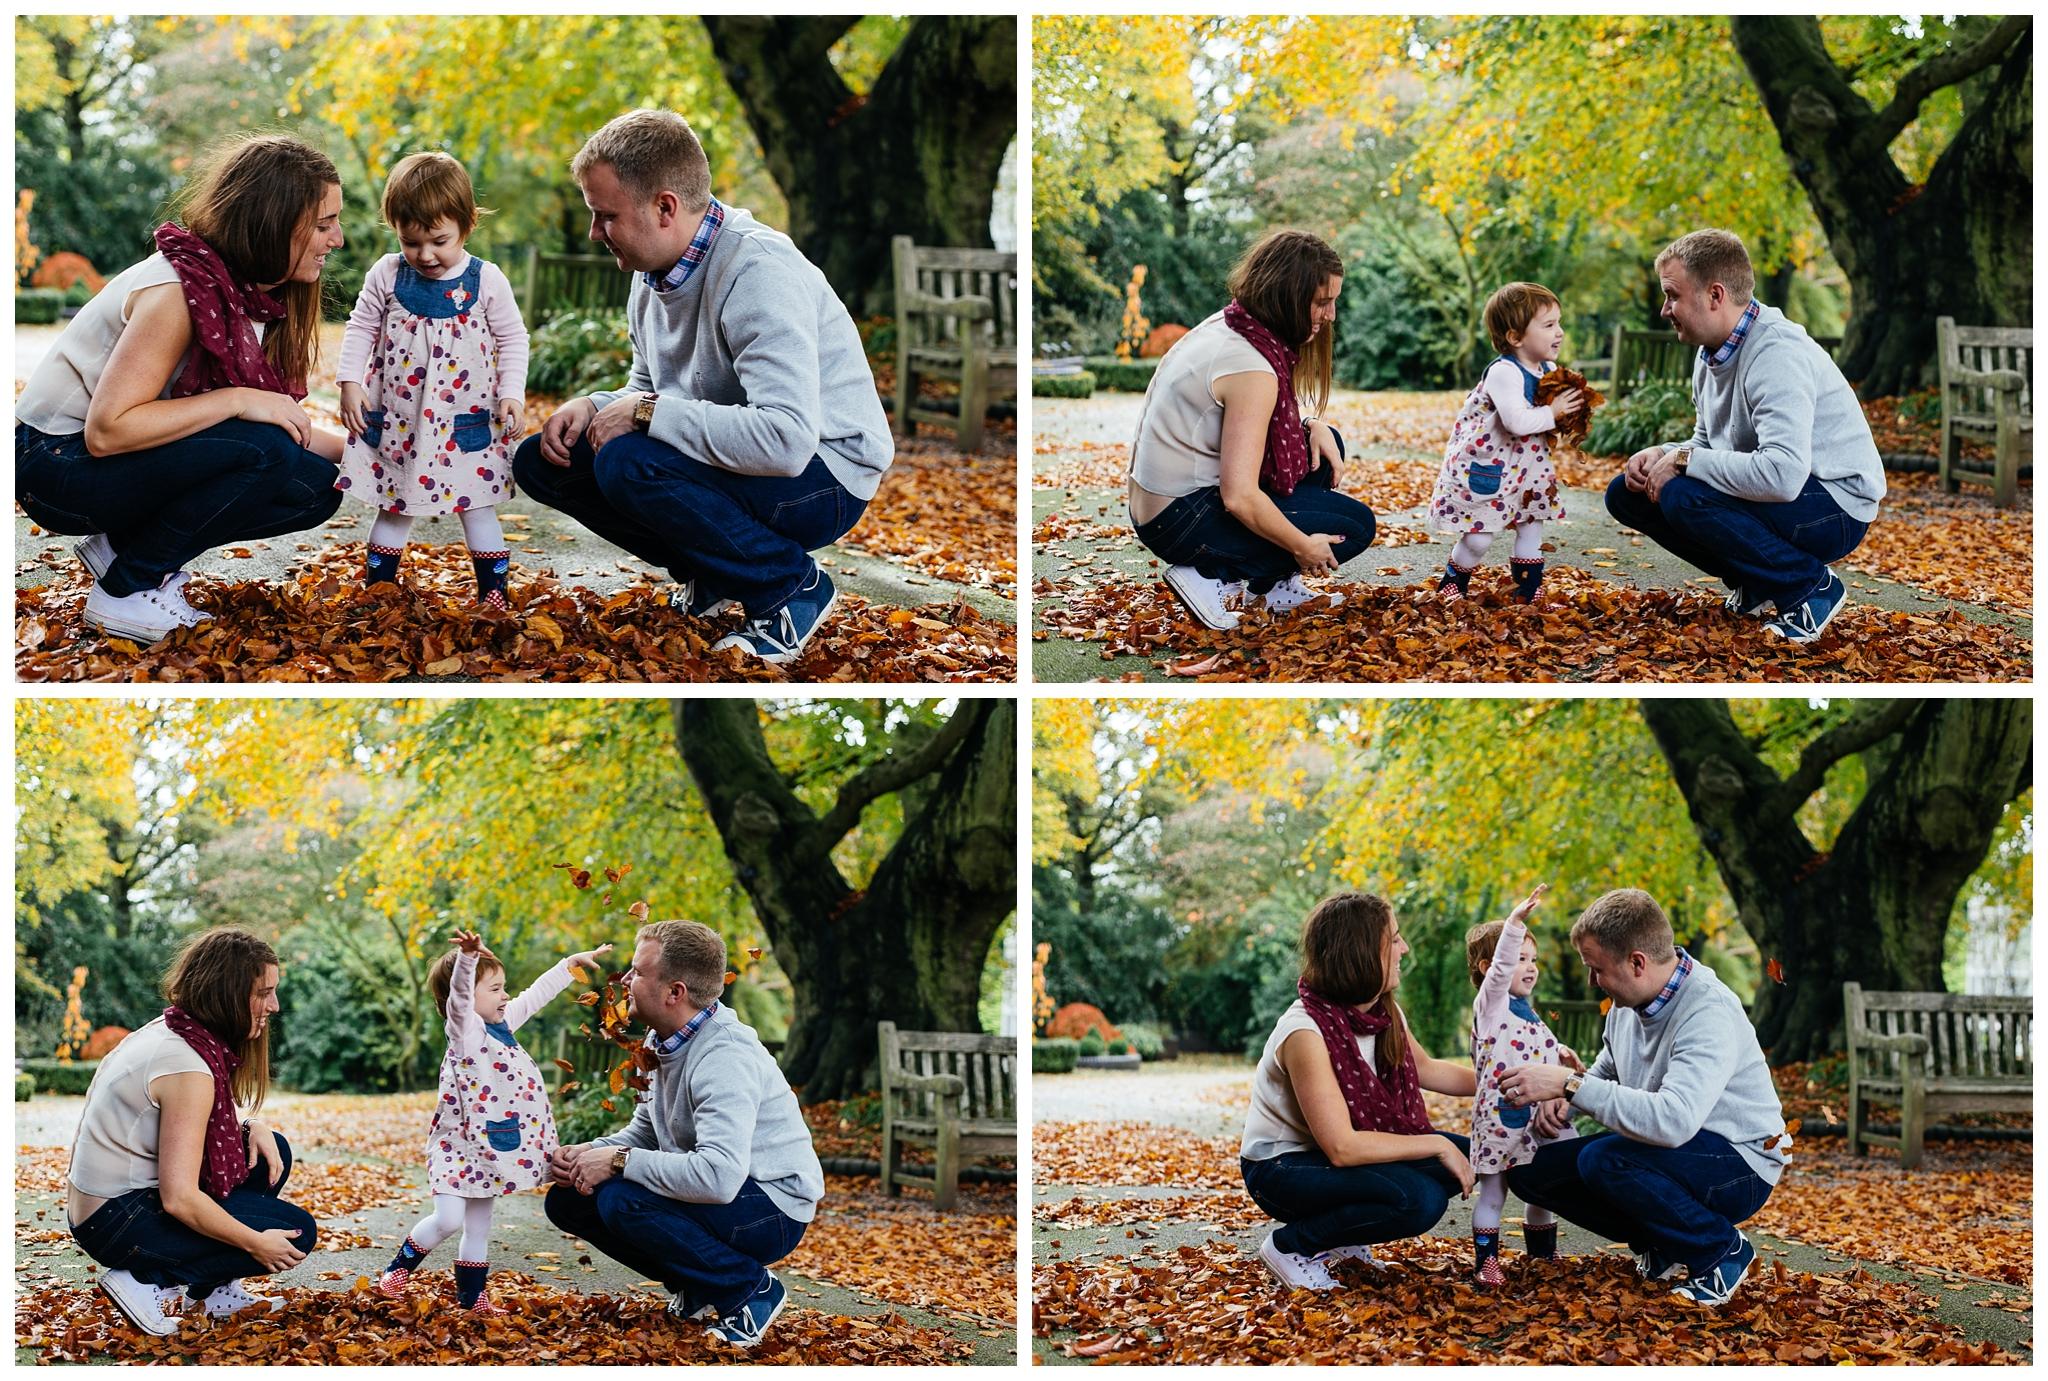 Autumn-family-portraits-birmingham-photographer_0020.jpg